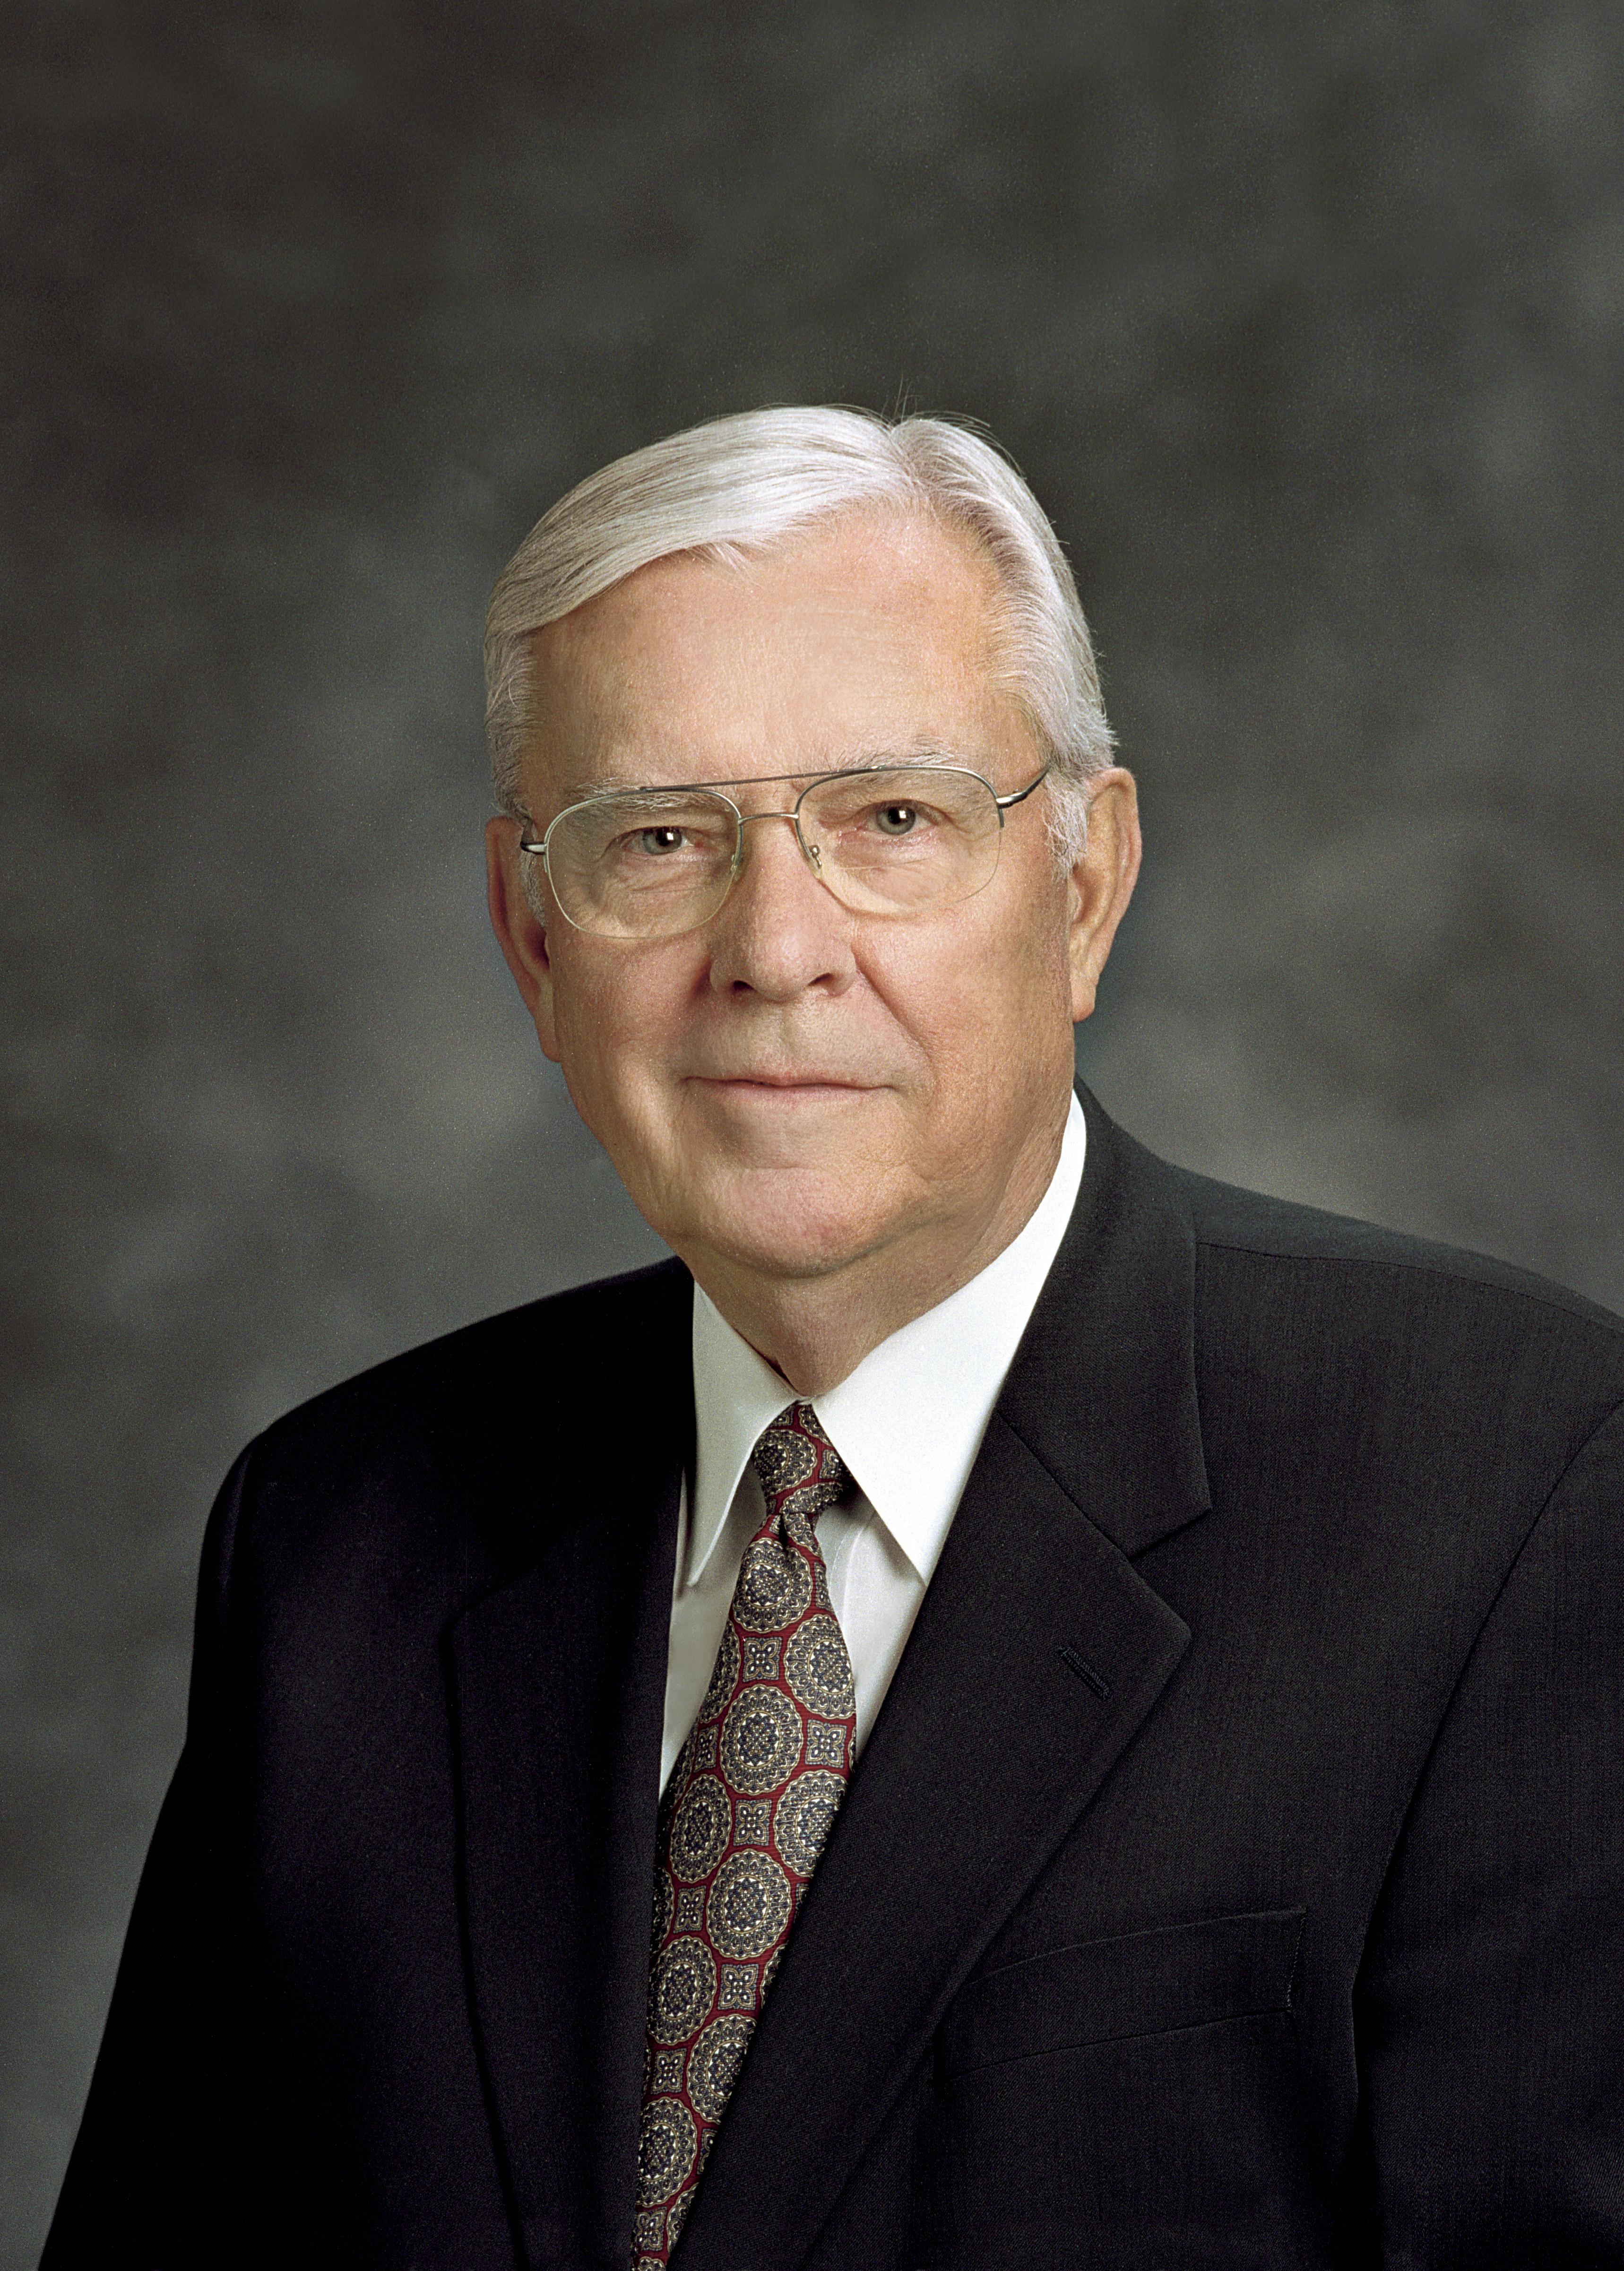 The official portrait of M. Russell Ballard.